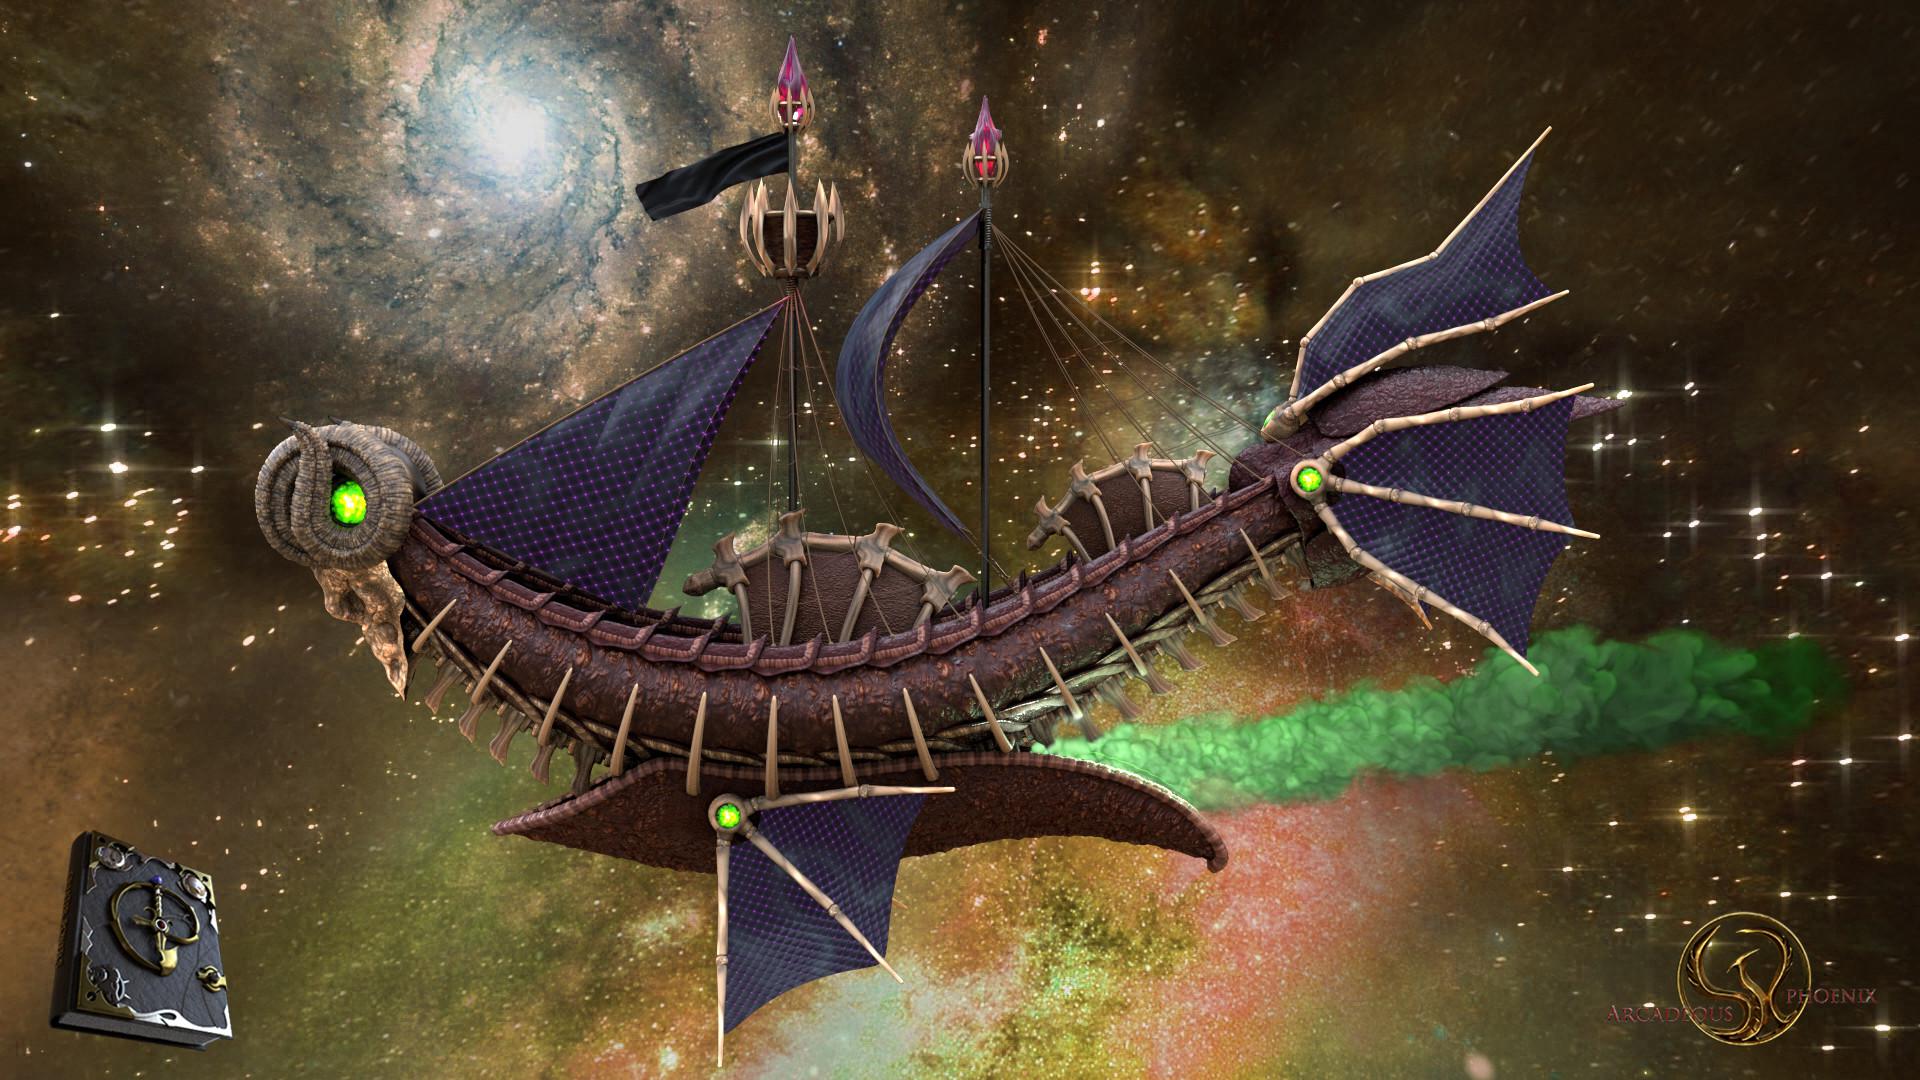 Arcadeous phoenix aries ship 0022b